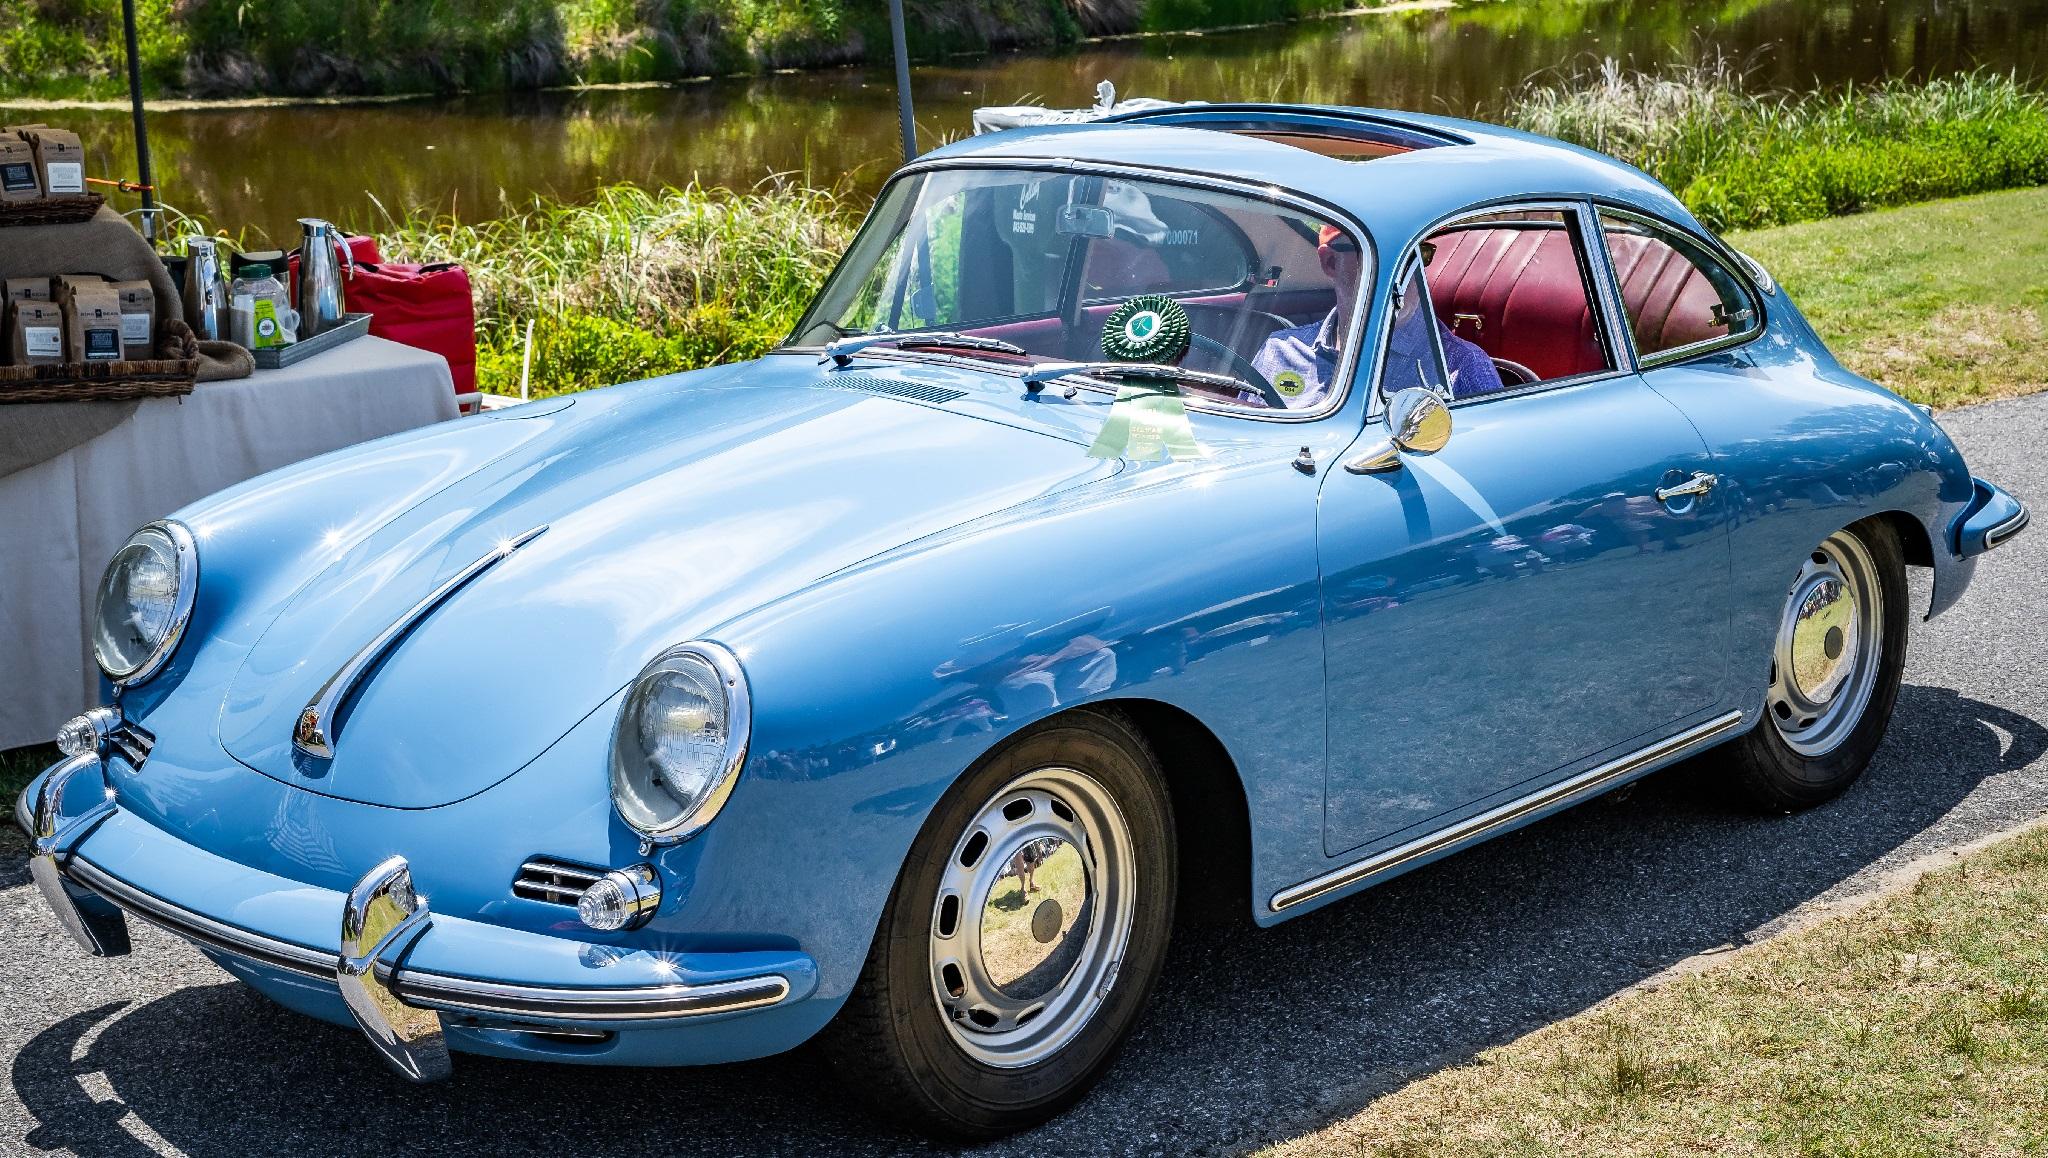 Class Award German - Michael Branning's '64 Porsche 356C Sunroof